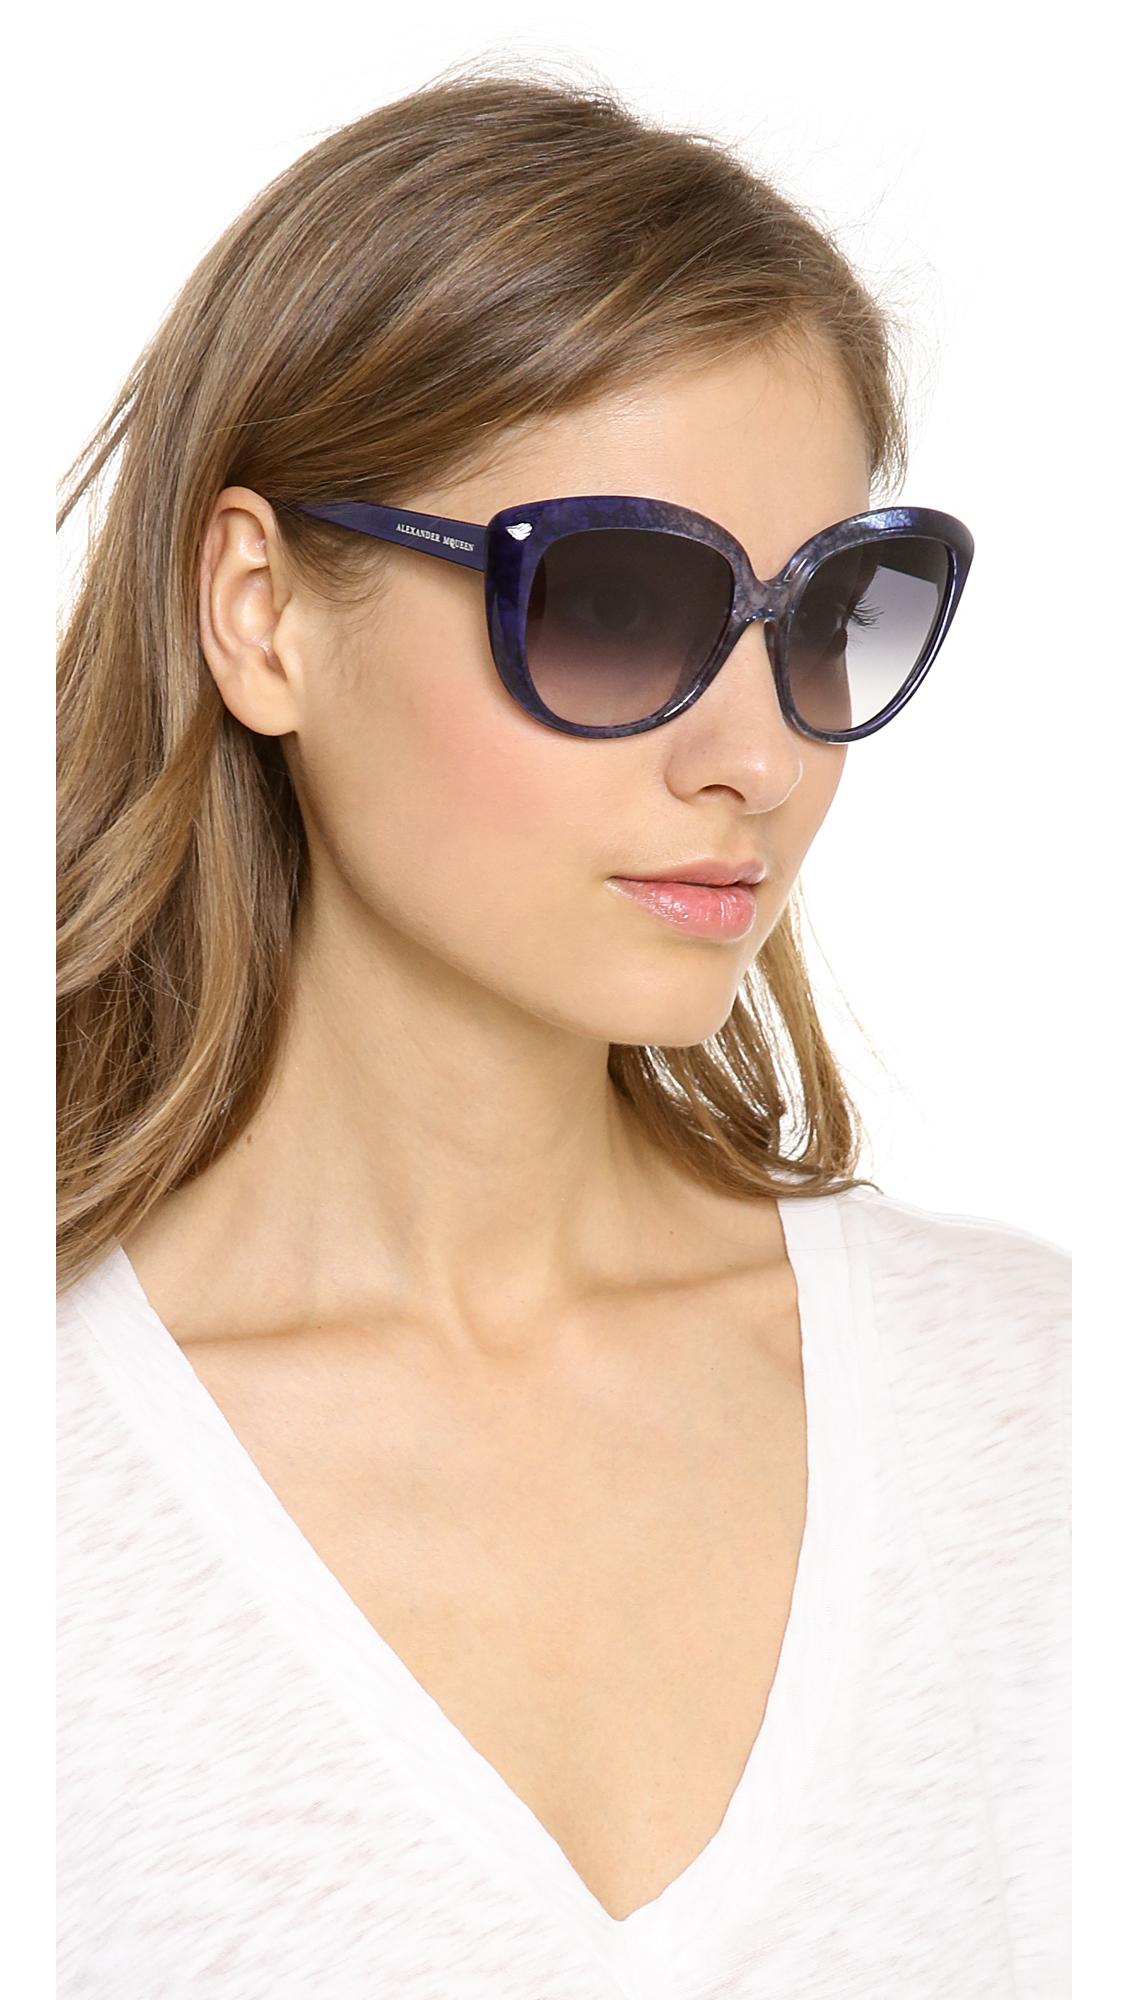 Alexander Mcqueen Cat Eye Sunglasses In Blue